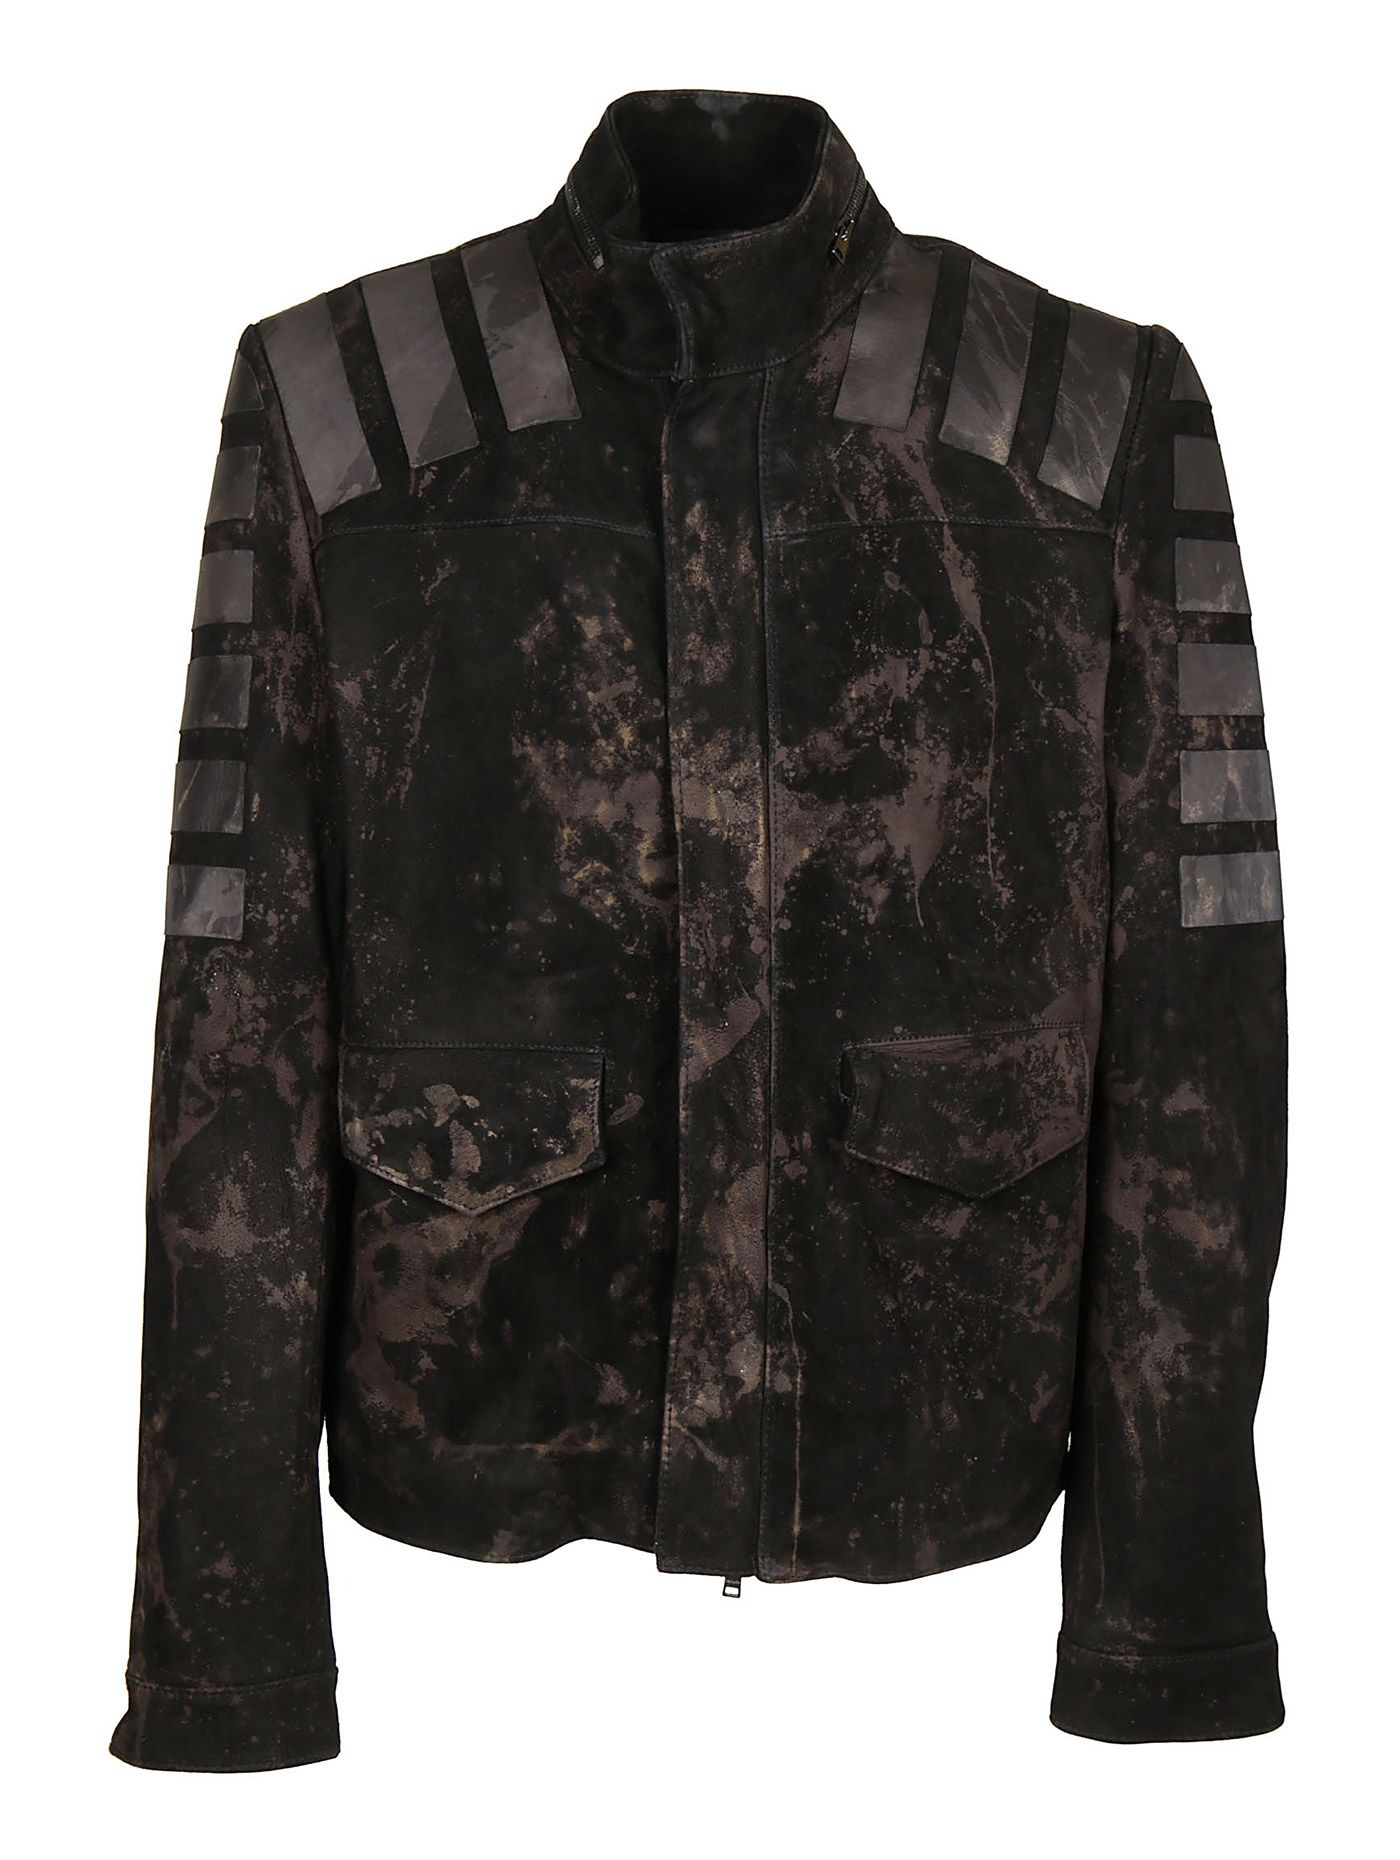 Divergent Jacket